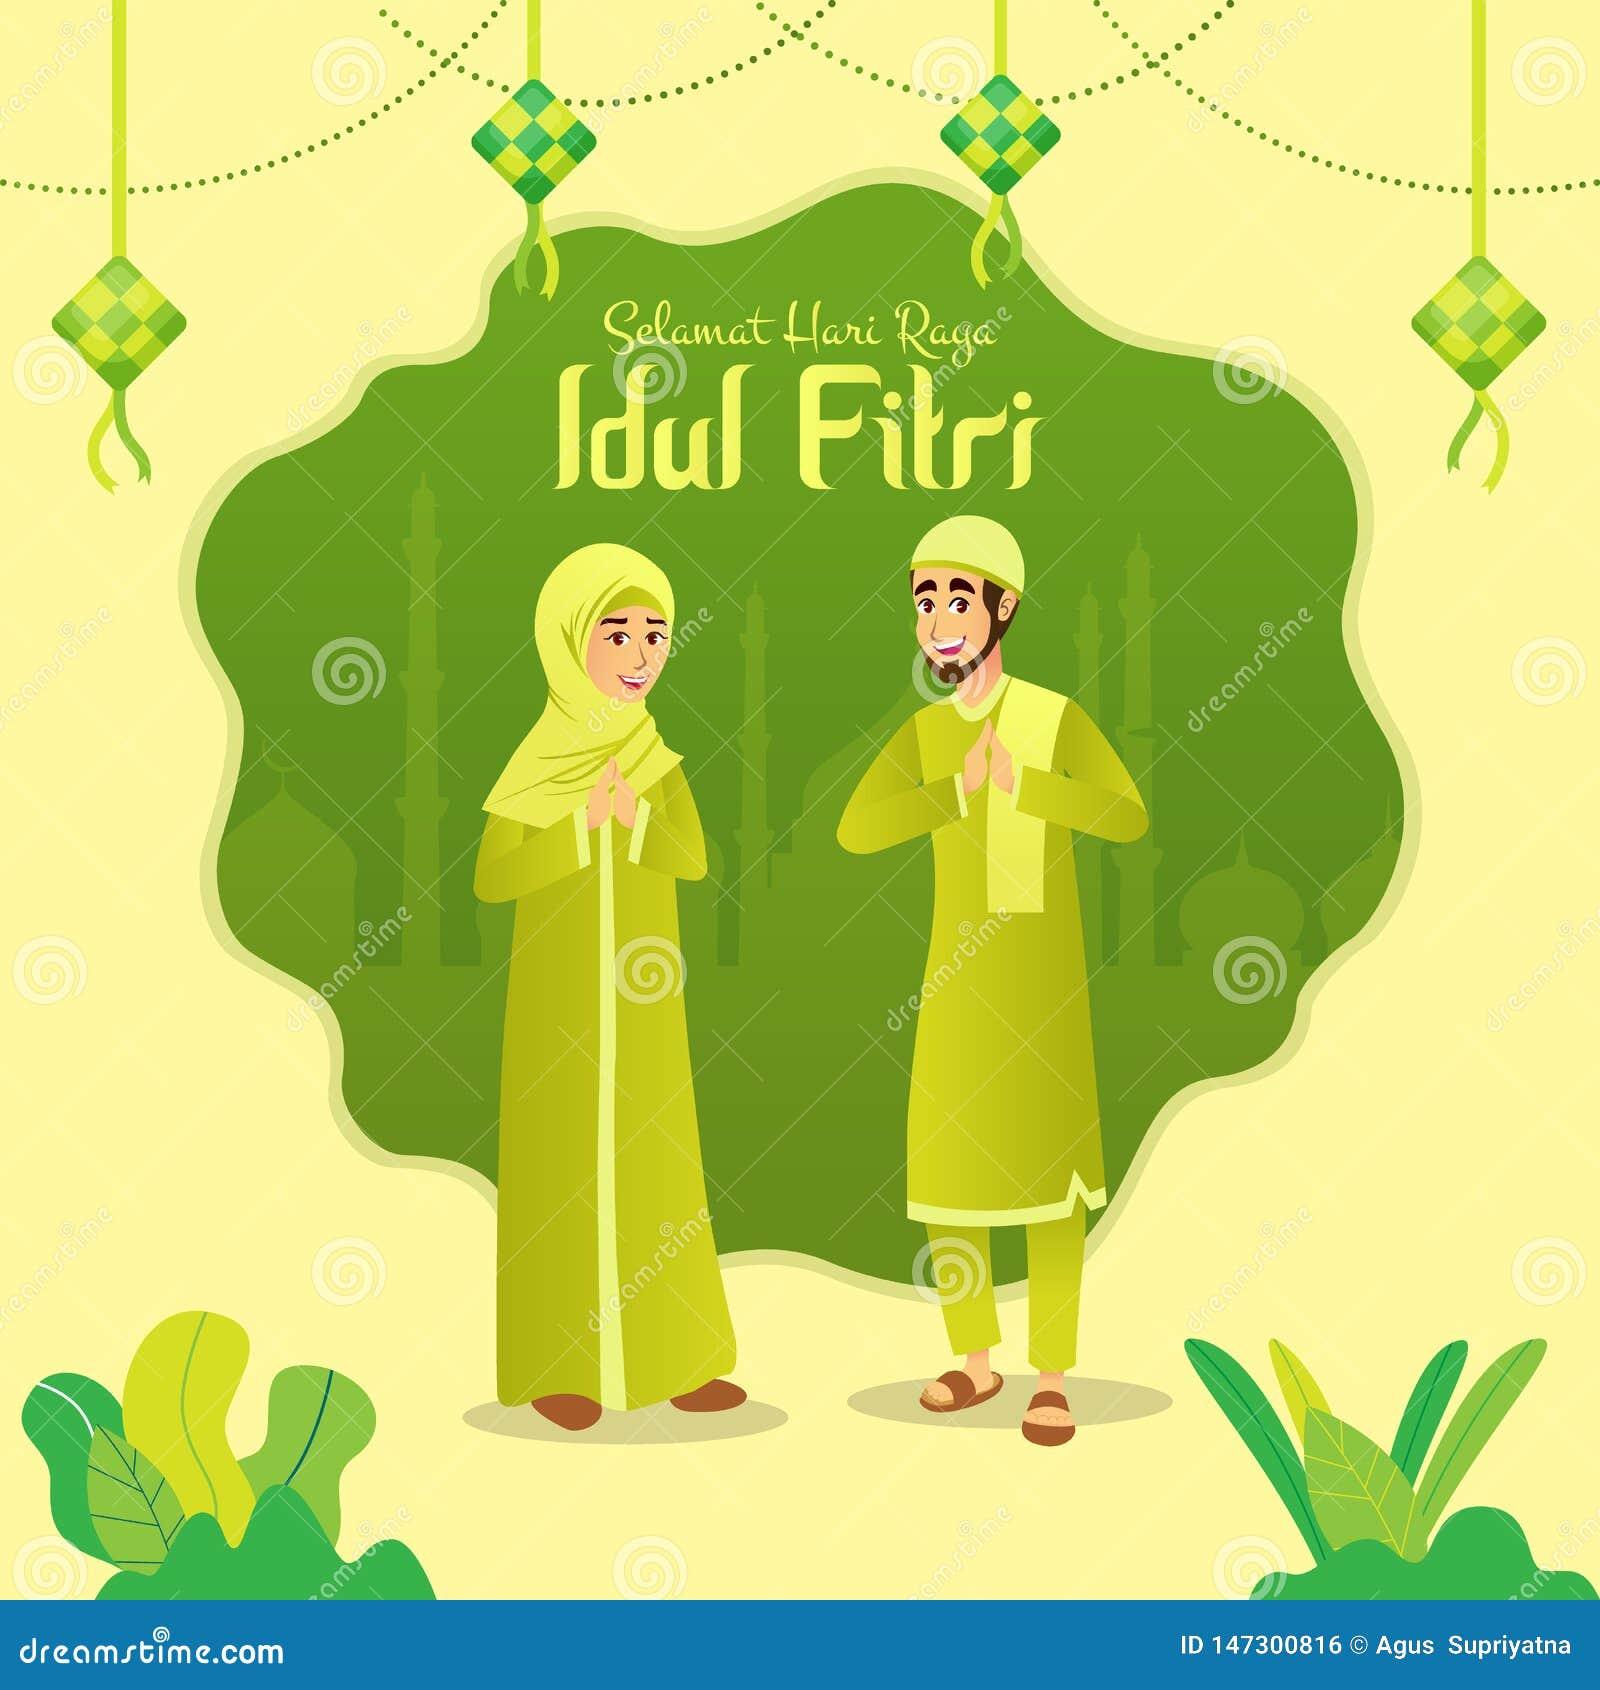 Selamat Hari Raya Idul Fitri Is Another Language Of Happy